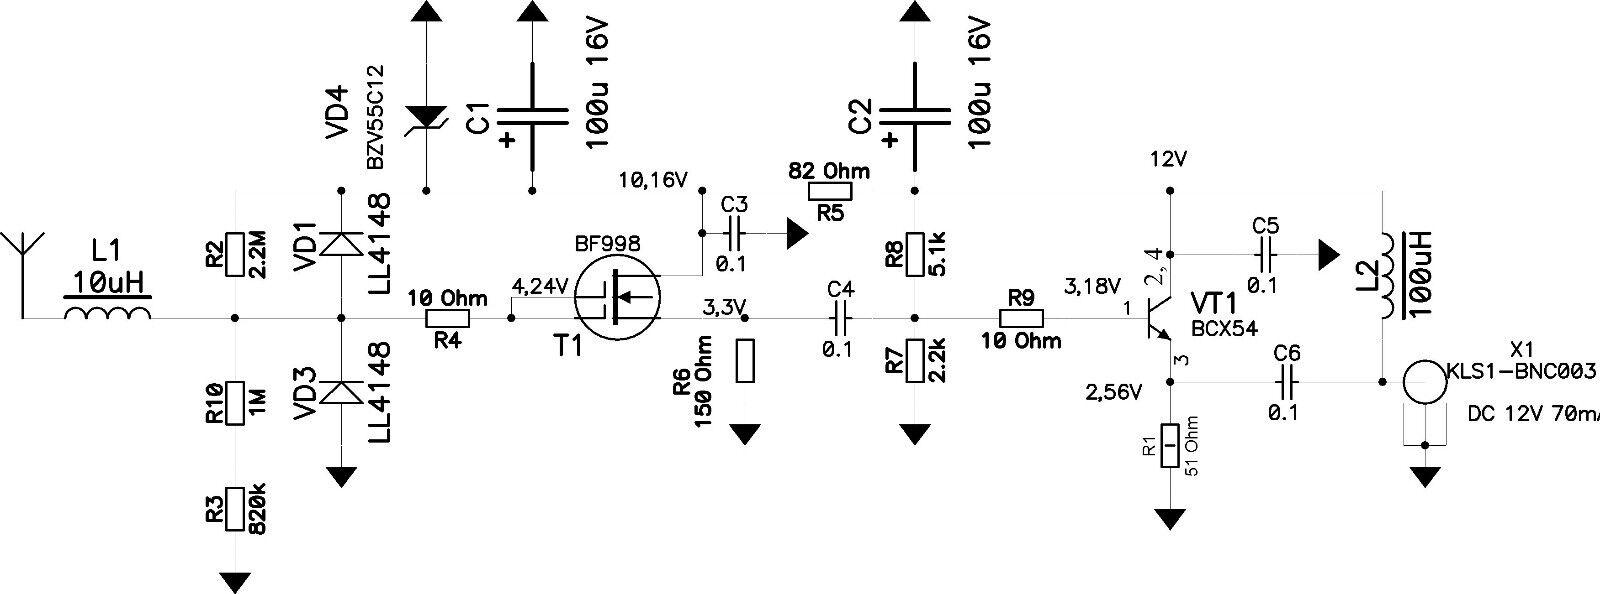 MiniWhip Active Antenna HF LF VLF mini whip shortwave sdr RX